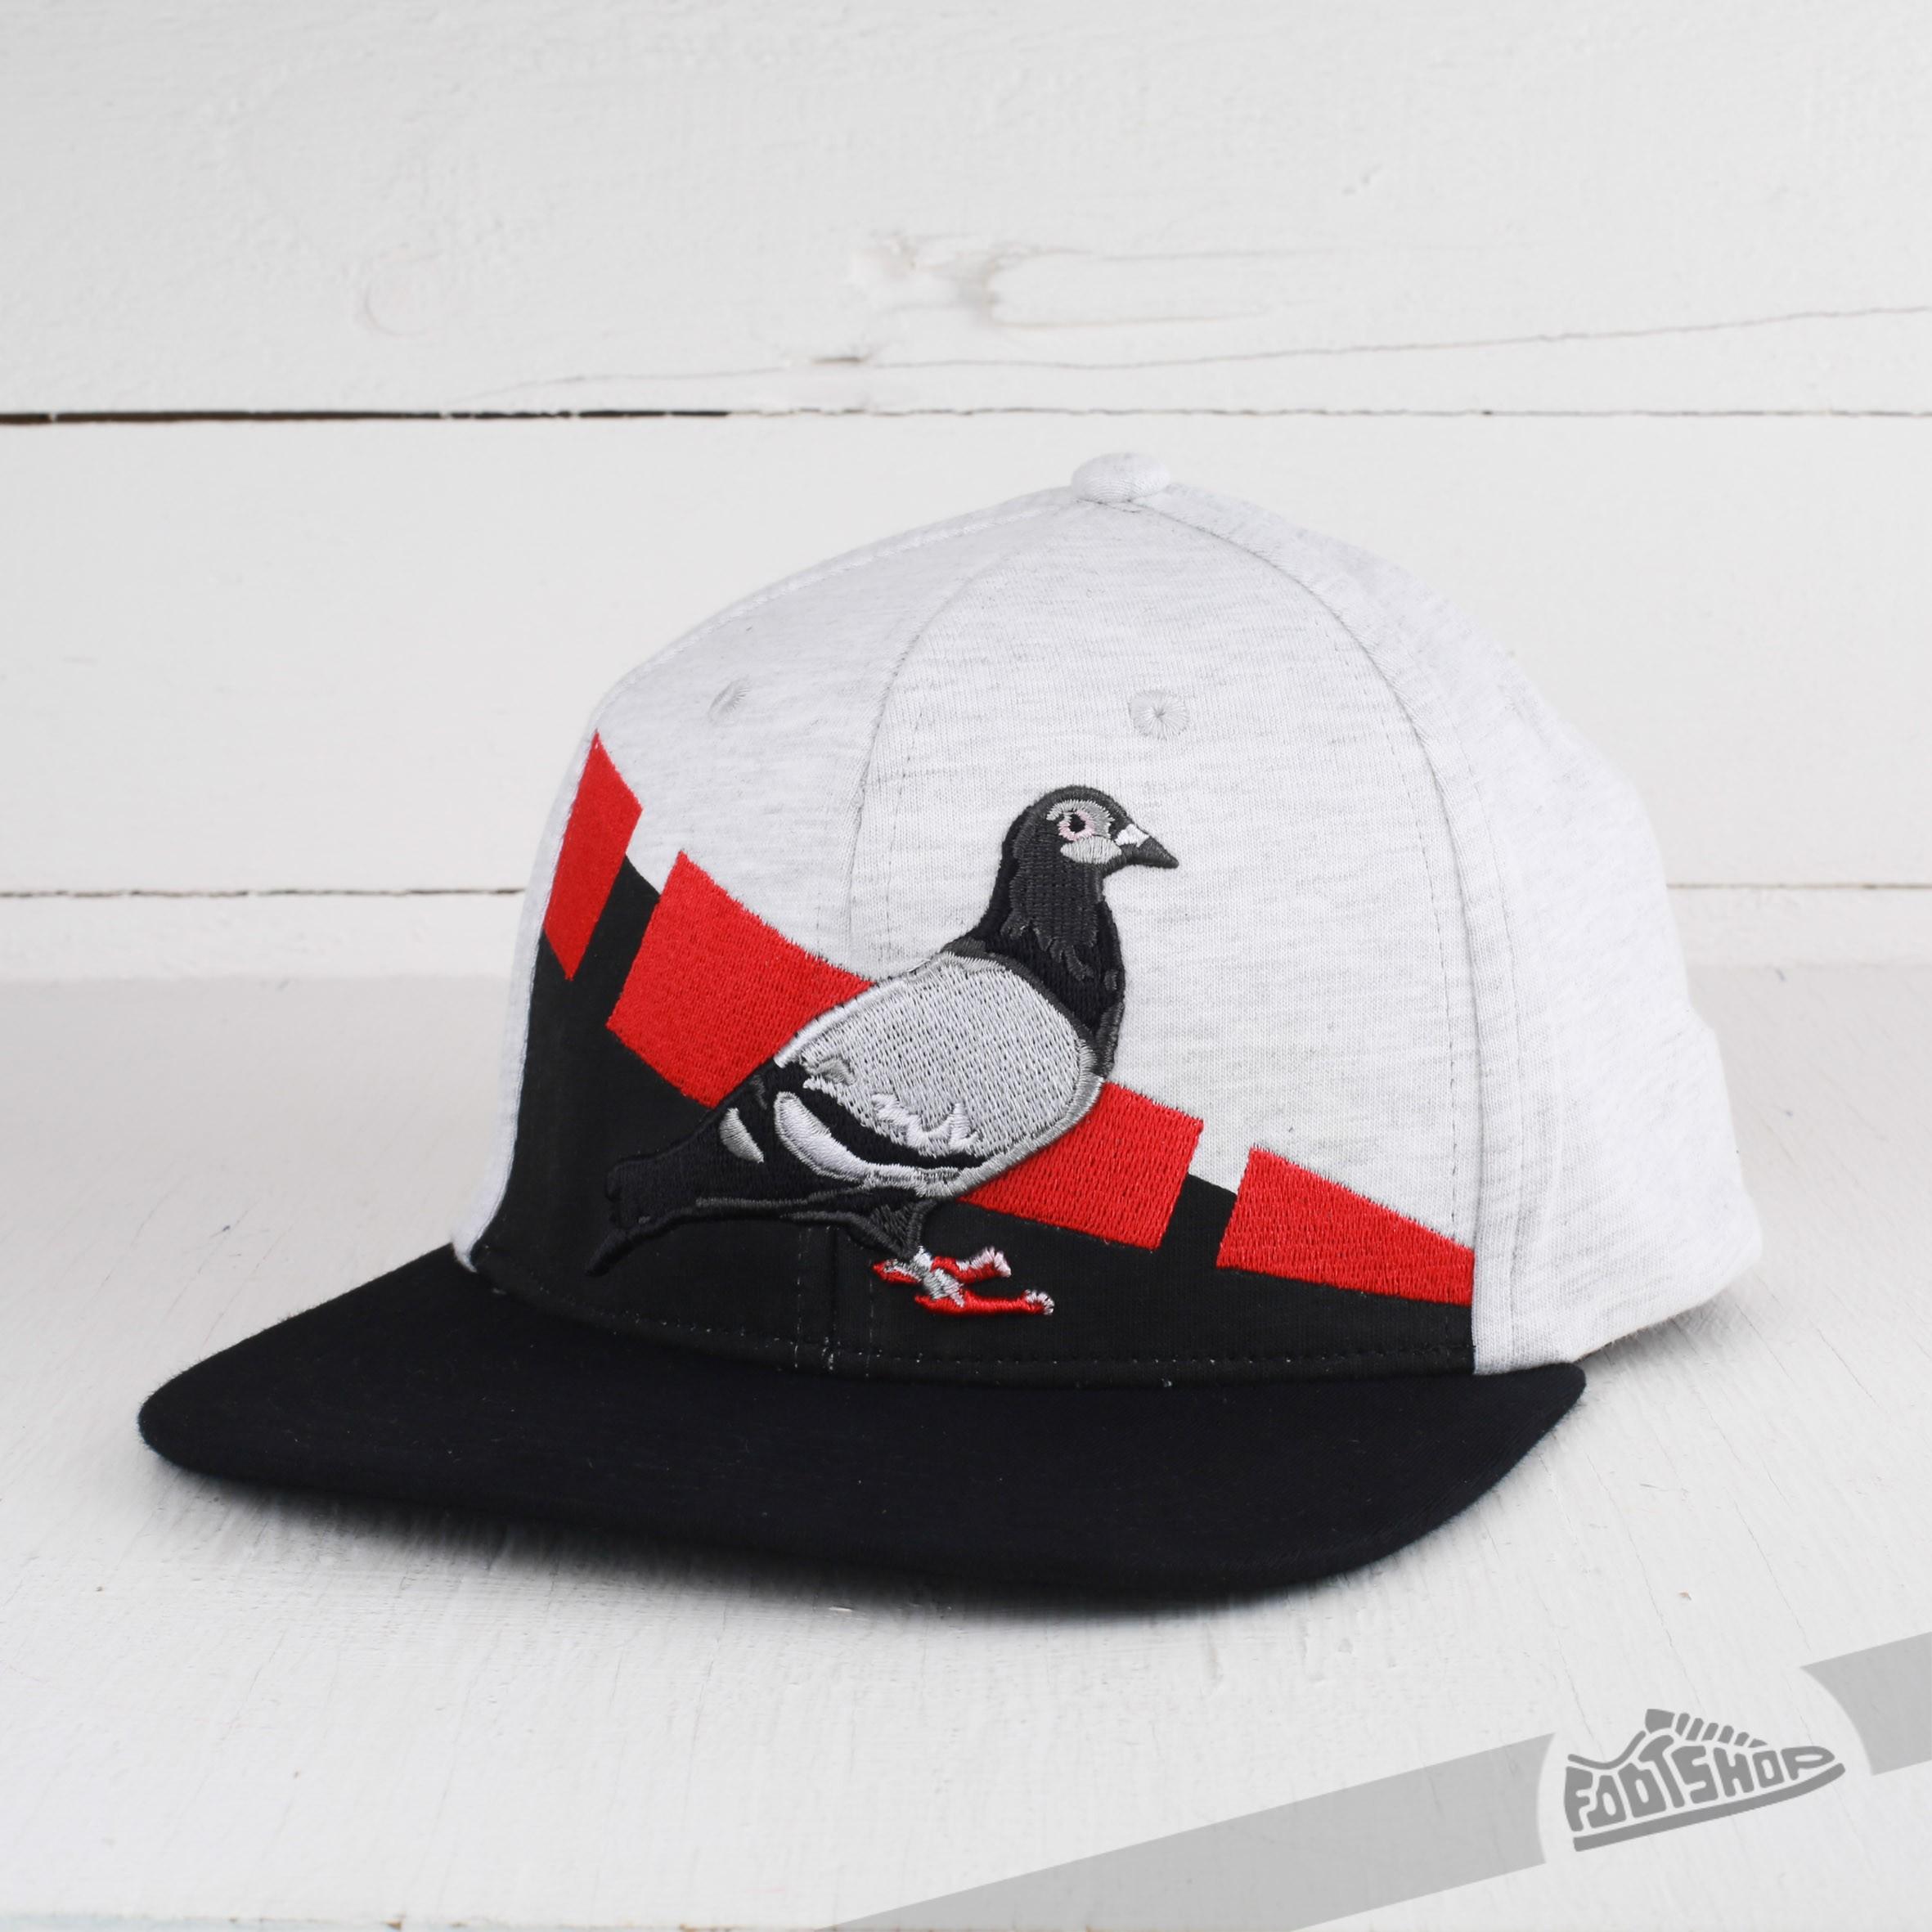 bffc9ec67a224 Staple Retro Pigeon Grey Snapback